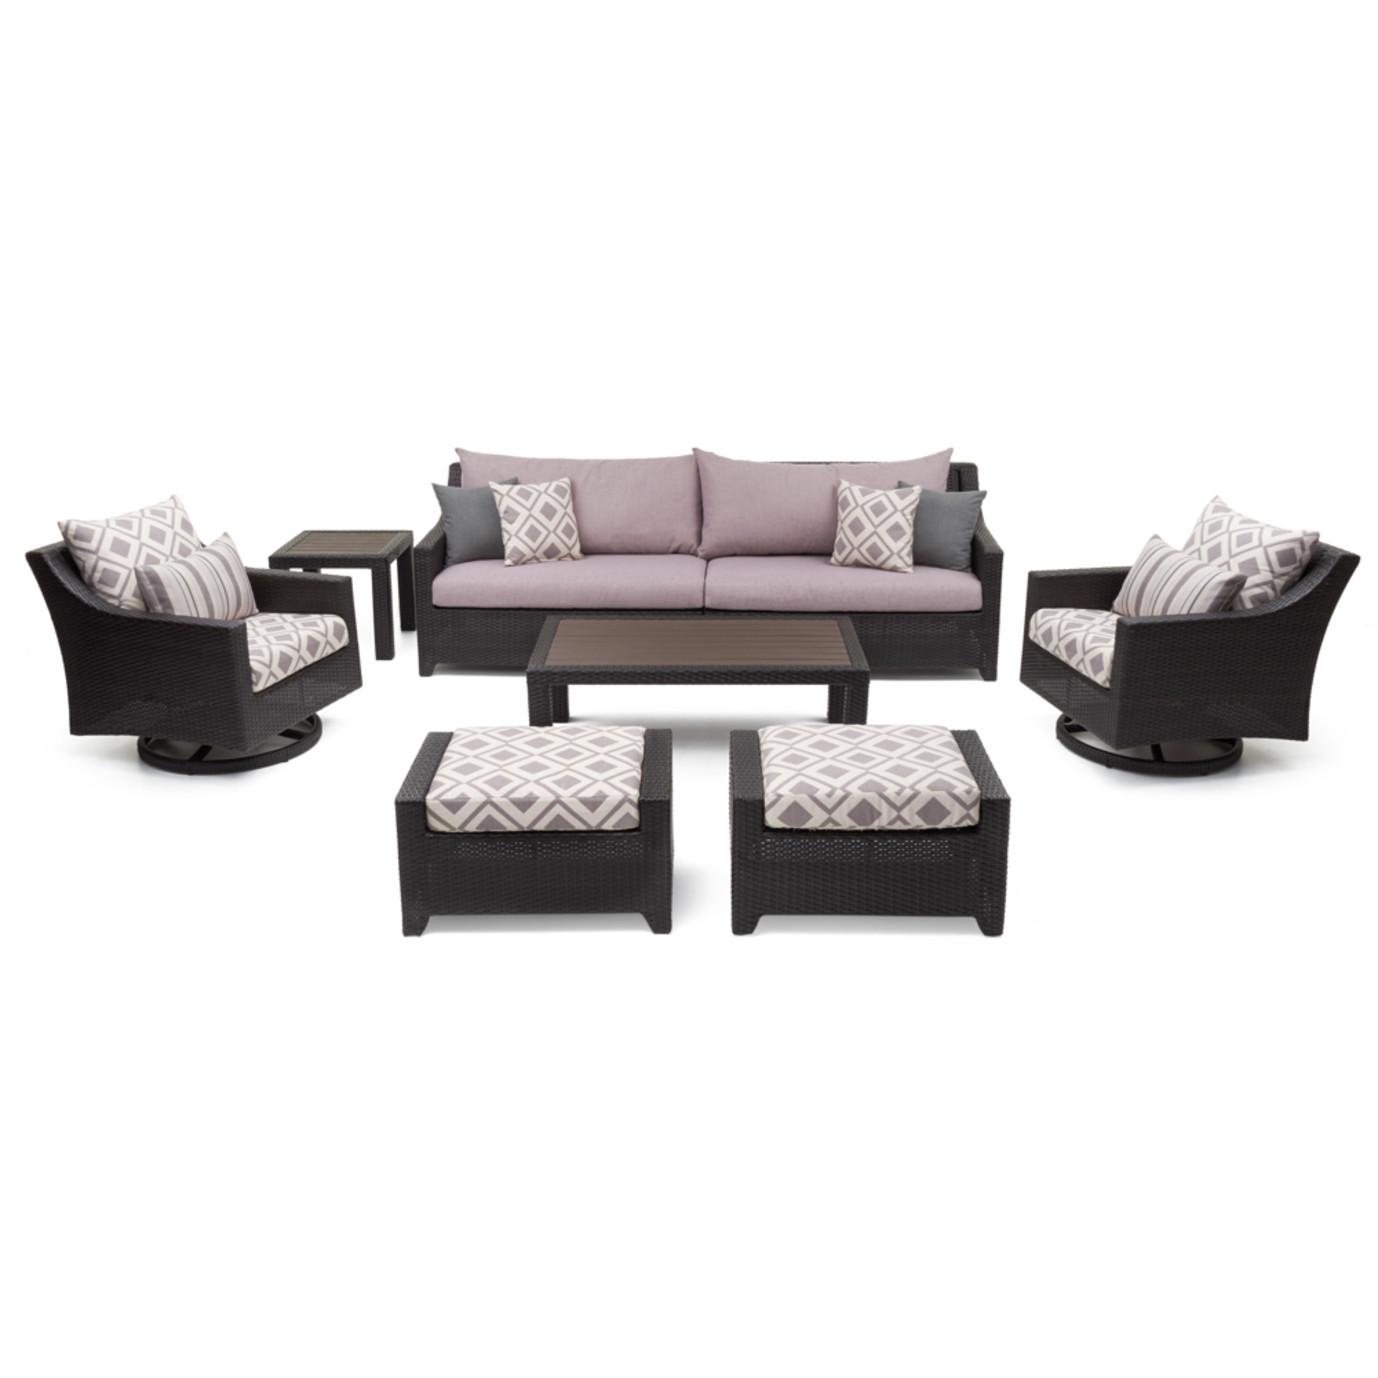 Deco Deluxe 8pc Sofa Amp Motion Club Chair Set Wisteria